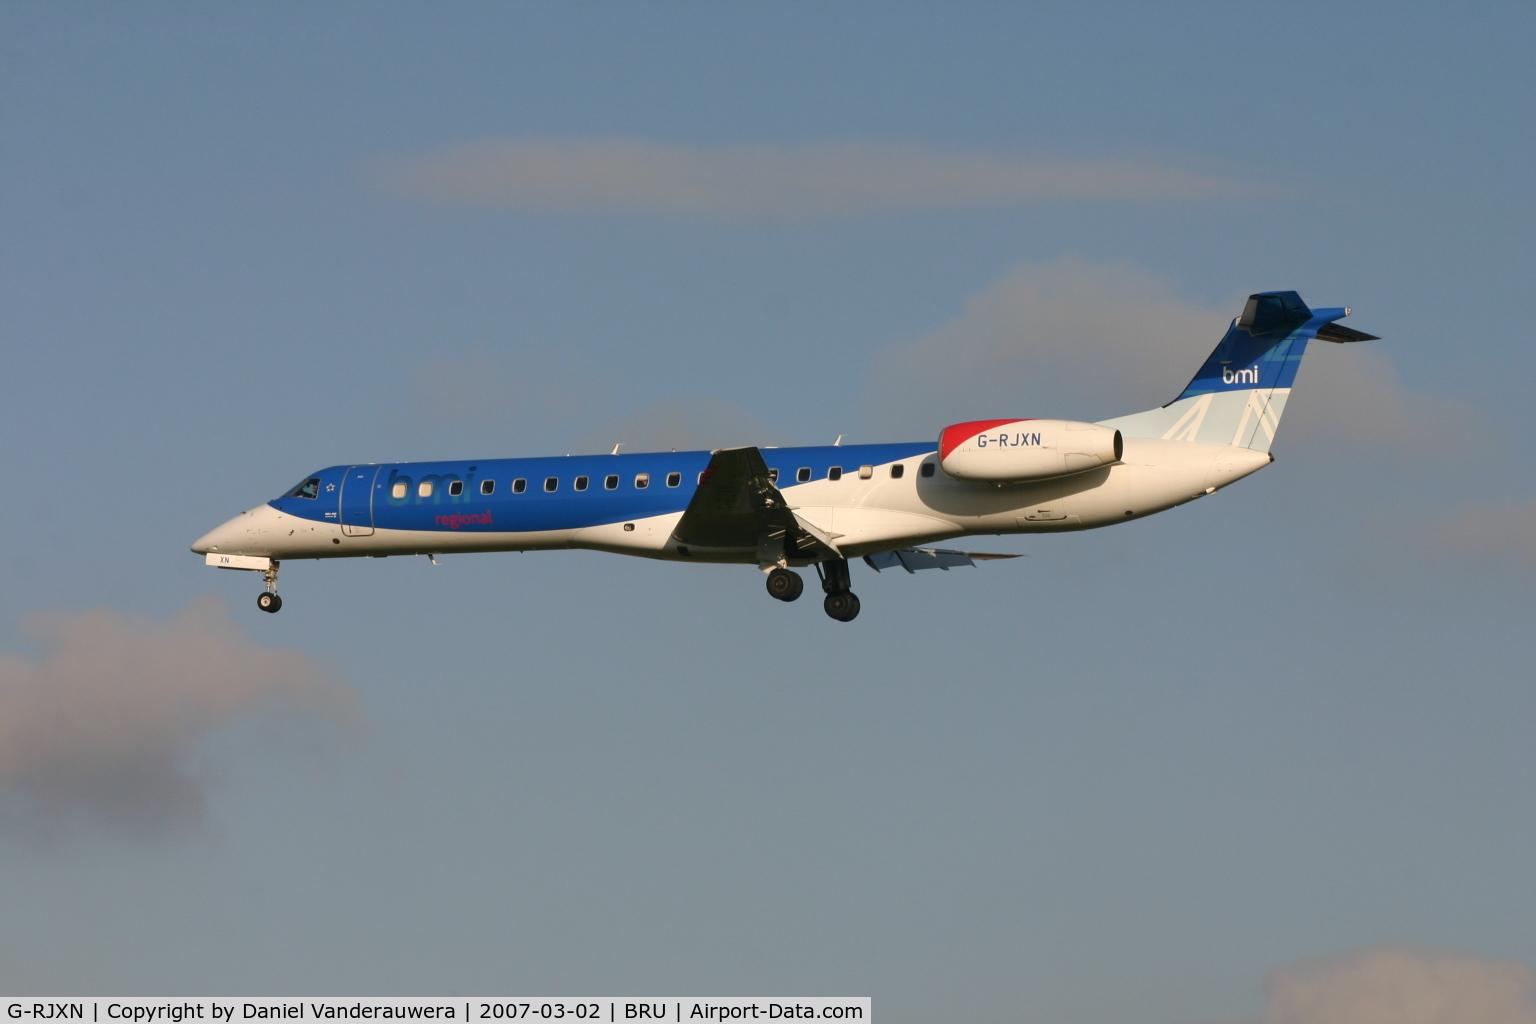 G-RJXN, 2000 Embraer ERJ-145MP (EMB-145MP) C/N 145336, flight BD627 is descending to rwy 25L